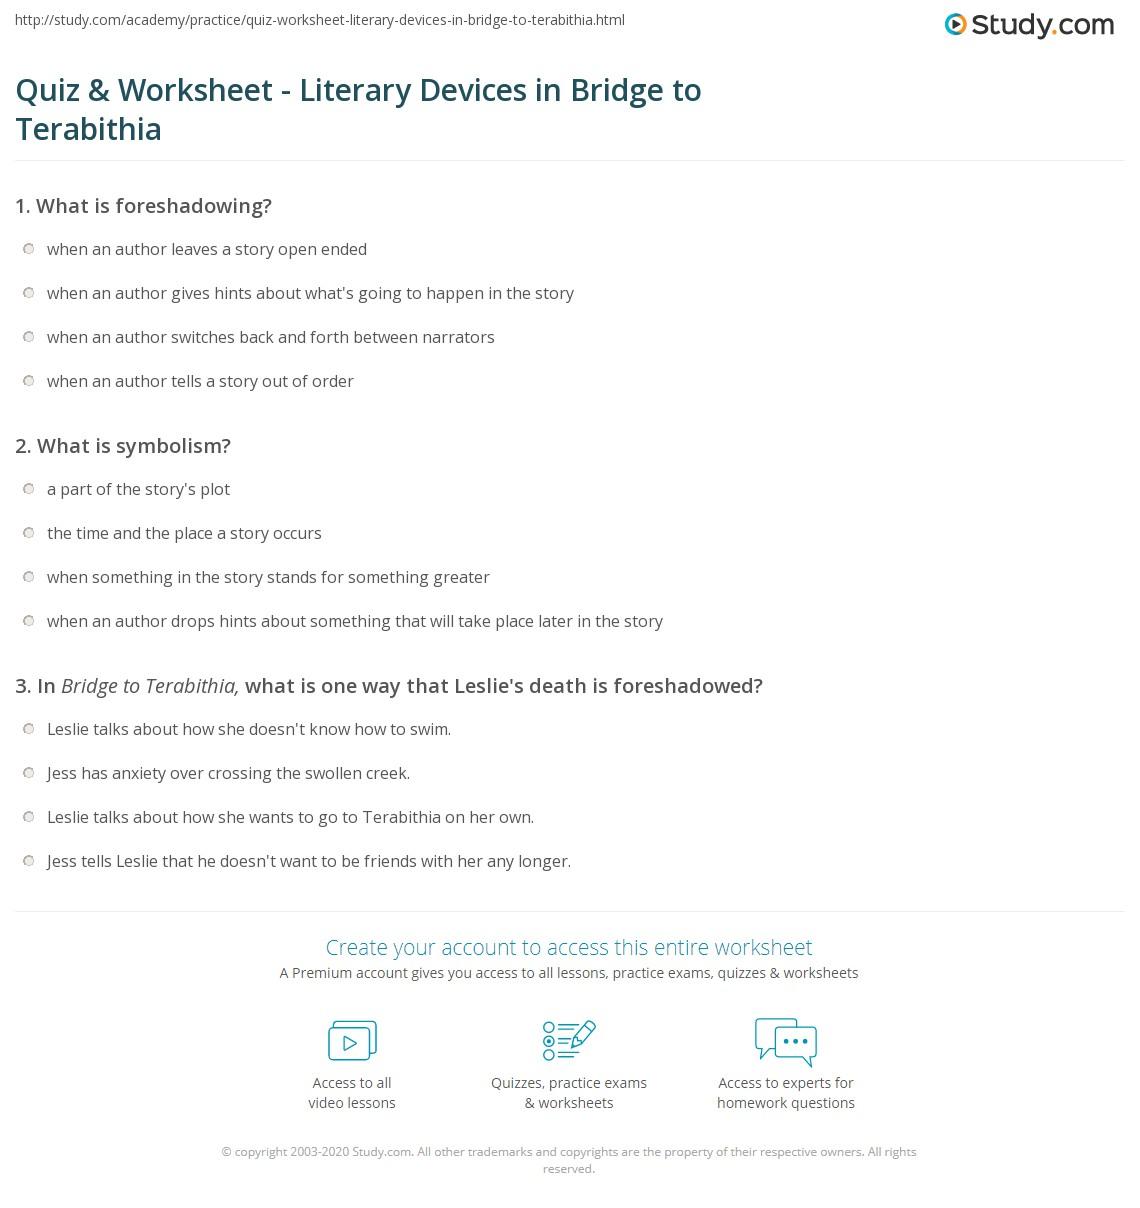 Quiz Worksheet Literary Devices In Bridge To Terabithia Study